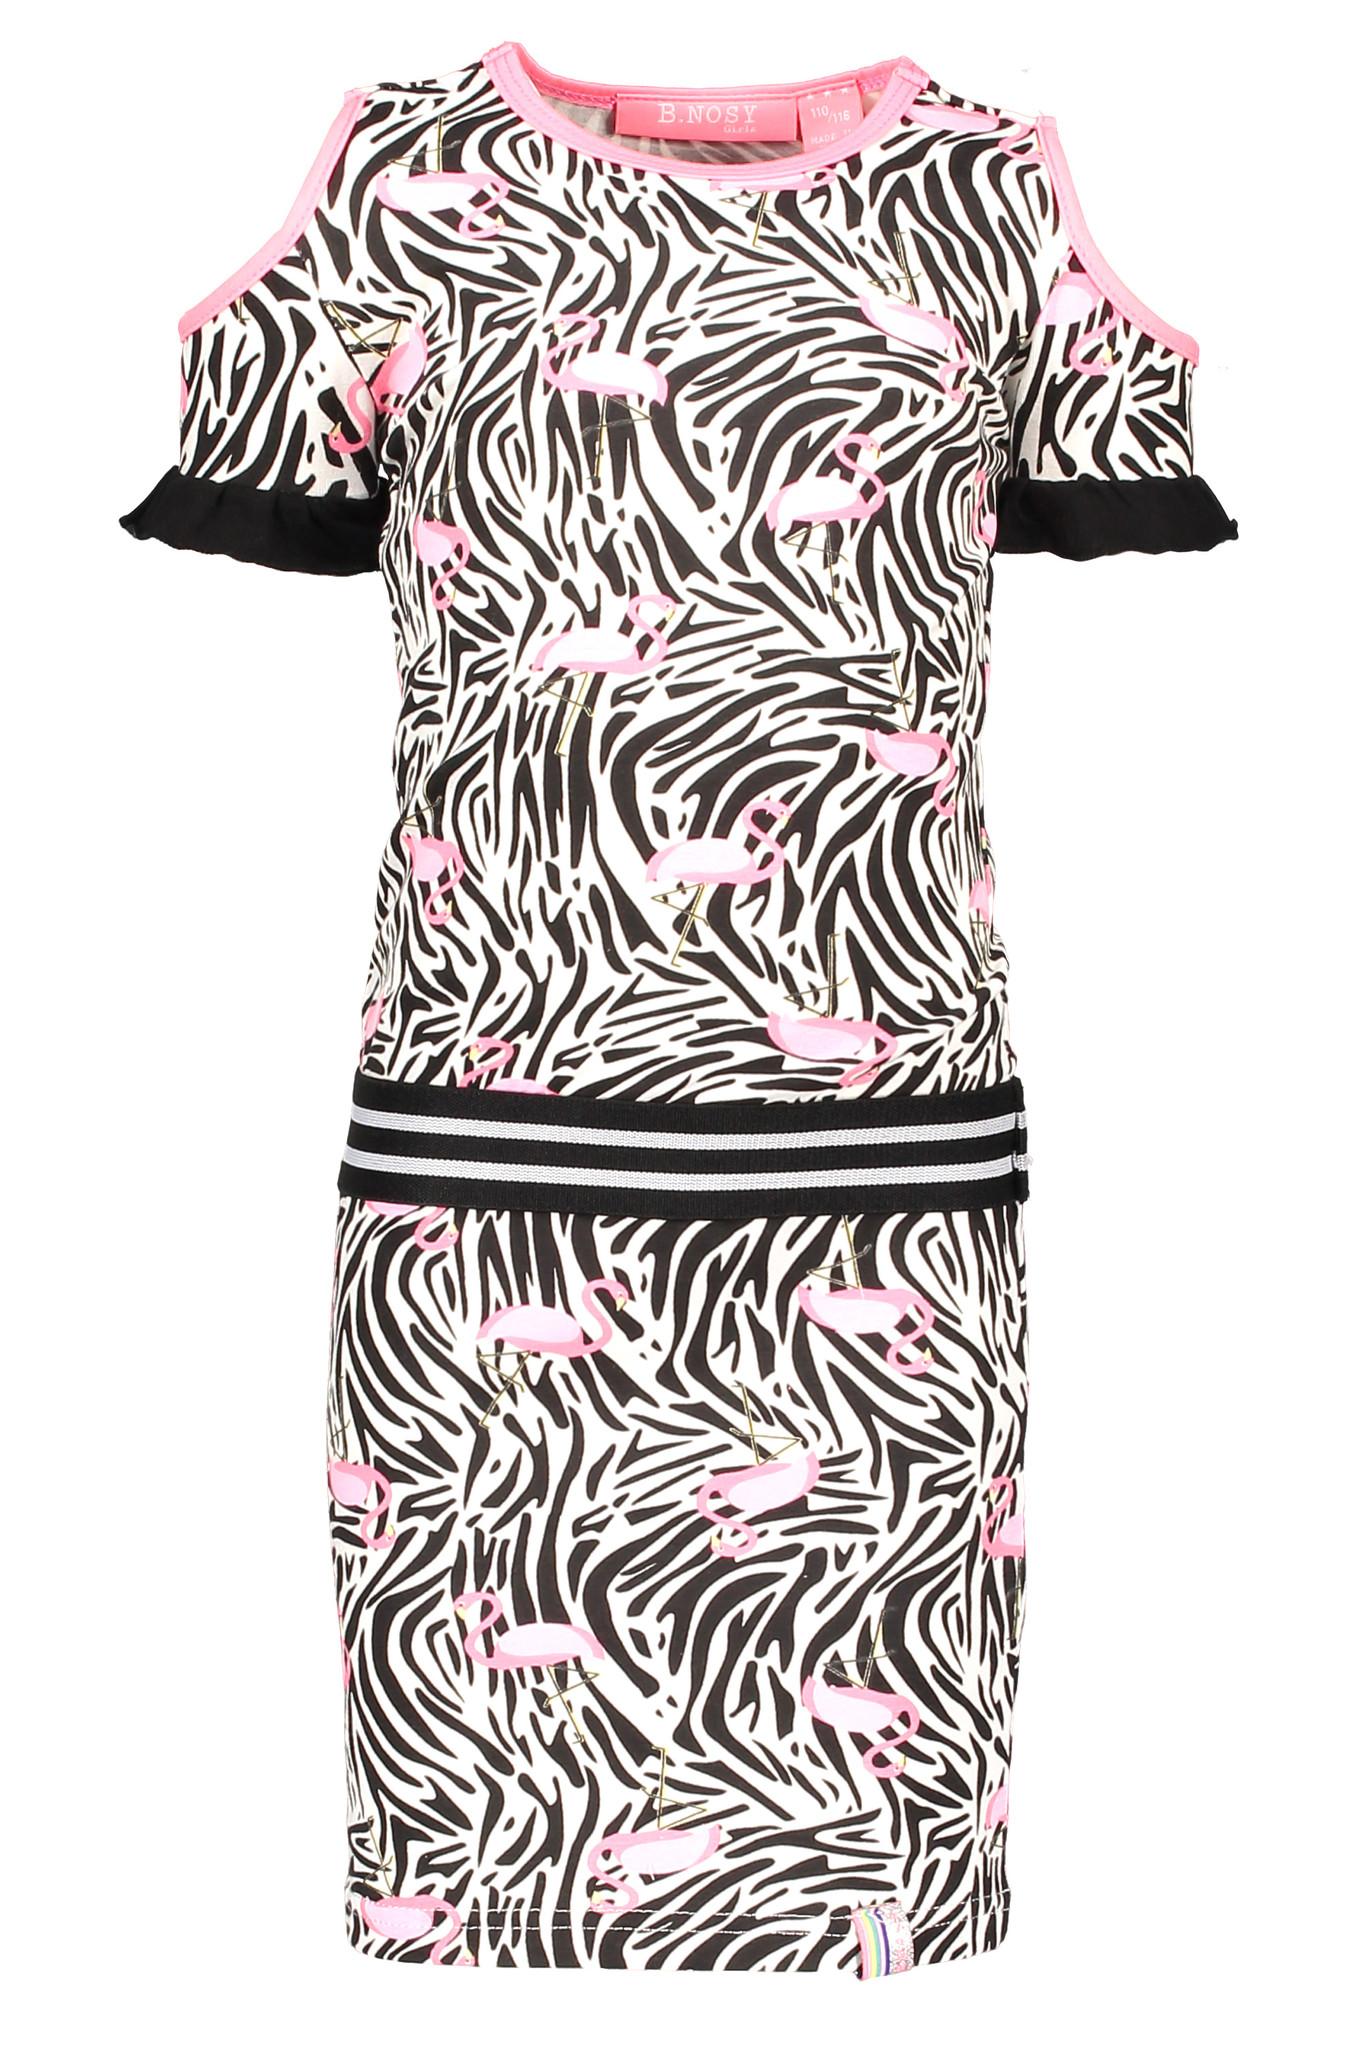 B.Nosy B.Nosy Jurk with open shoulder part white flamingo zebra ao